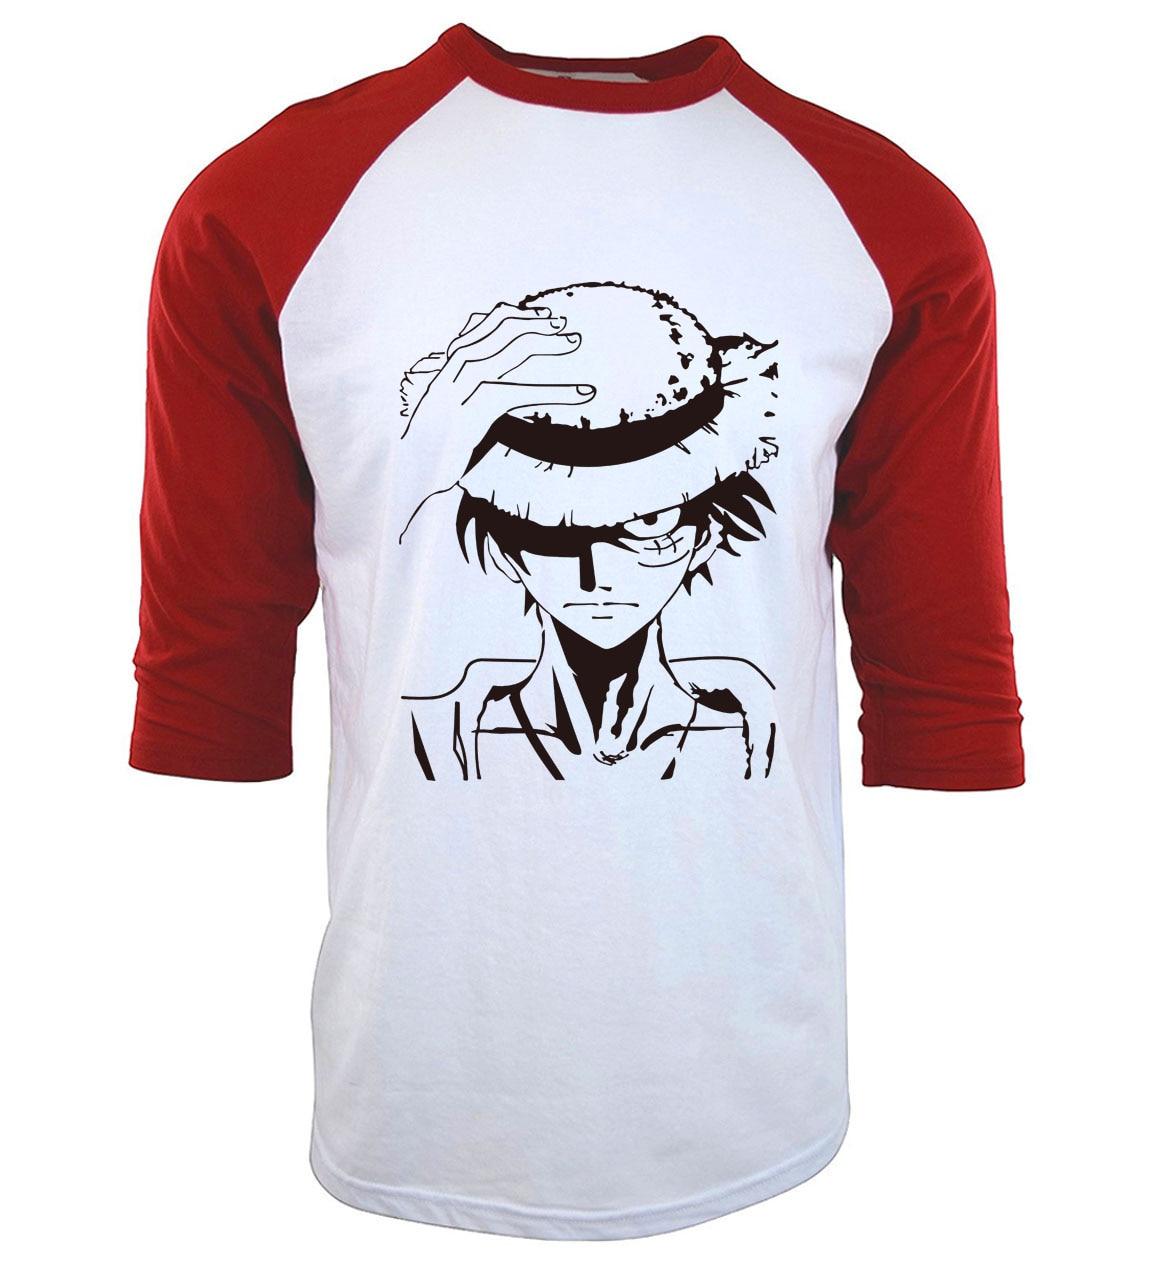 hot sale man's raglan cotton t shirts men one piece three-quarter sleeve brand clothing 2019 summer bodybuilding tee shirt homme